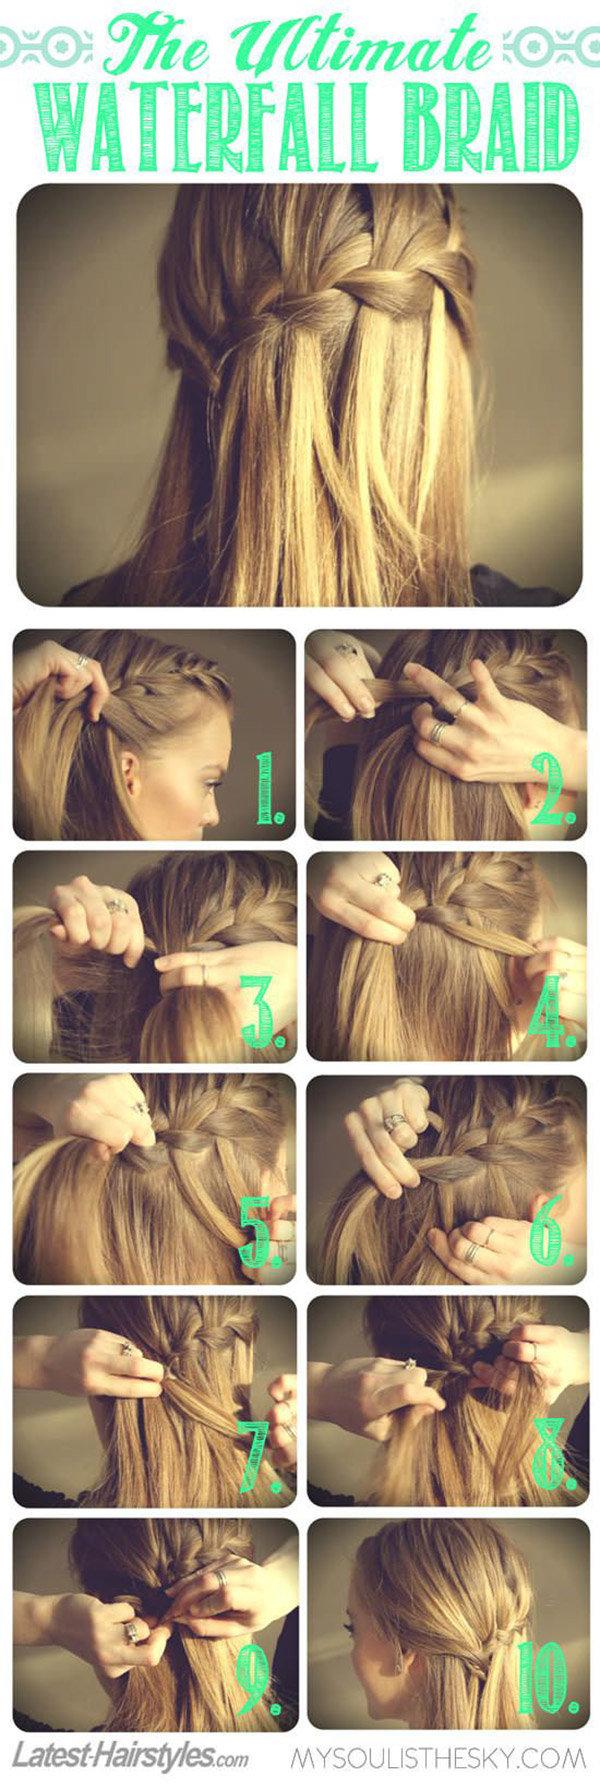 Remarkable 10 Beautiful Diy Hairstyles To Wear To A Wedding Bridalguide Short Hairstyles Gunalazisus